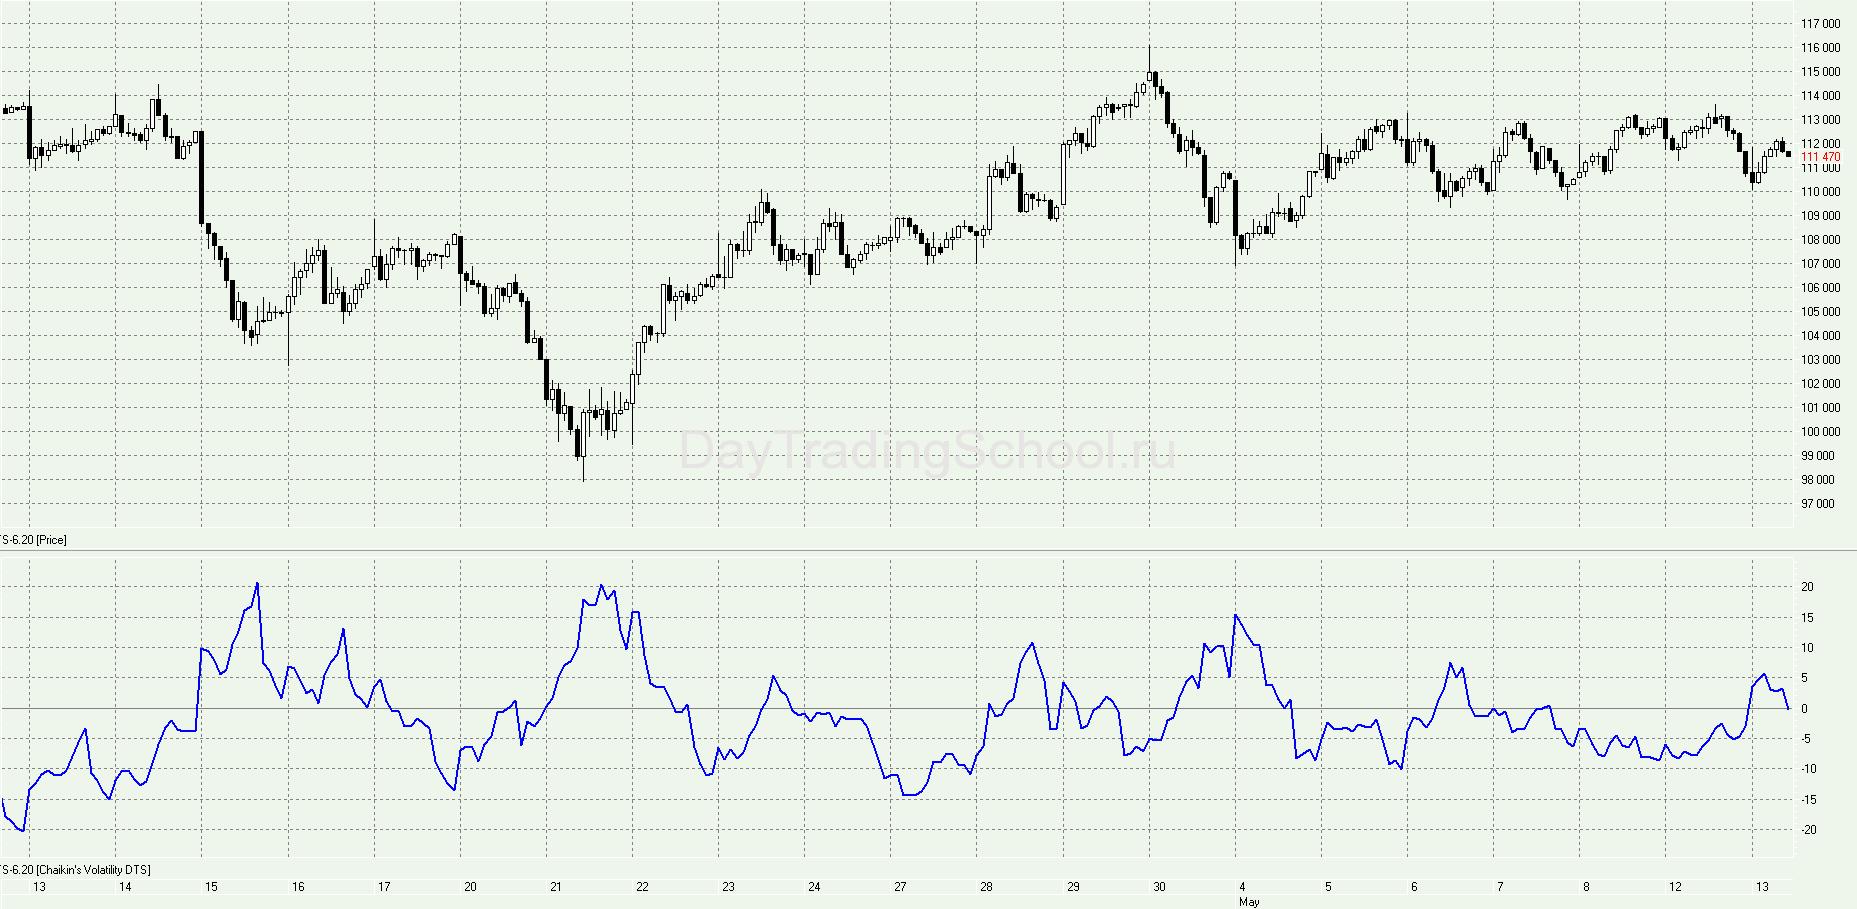 Chaikins-Volatility-график